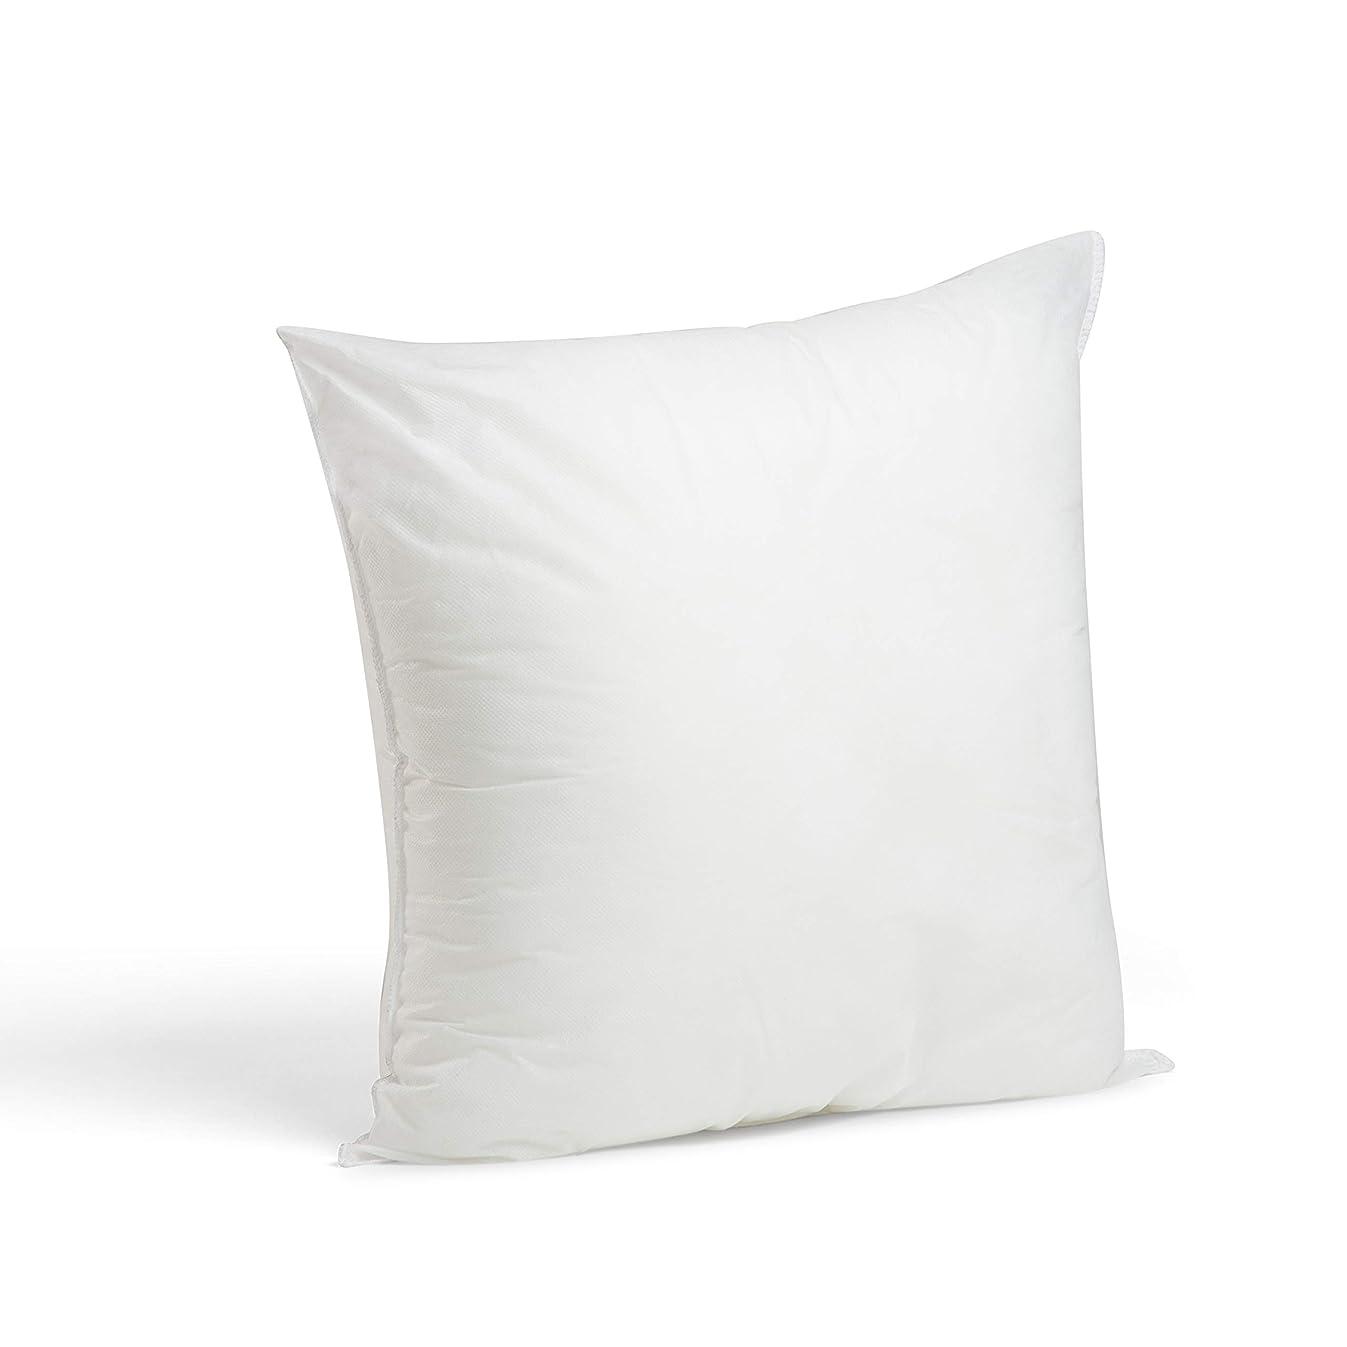 Foamily Premium Hypoallergenic Stuffer Pillow Insert Sham Square Form Polyester, 18